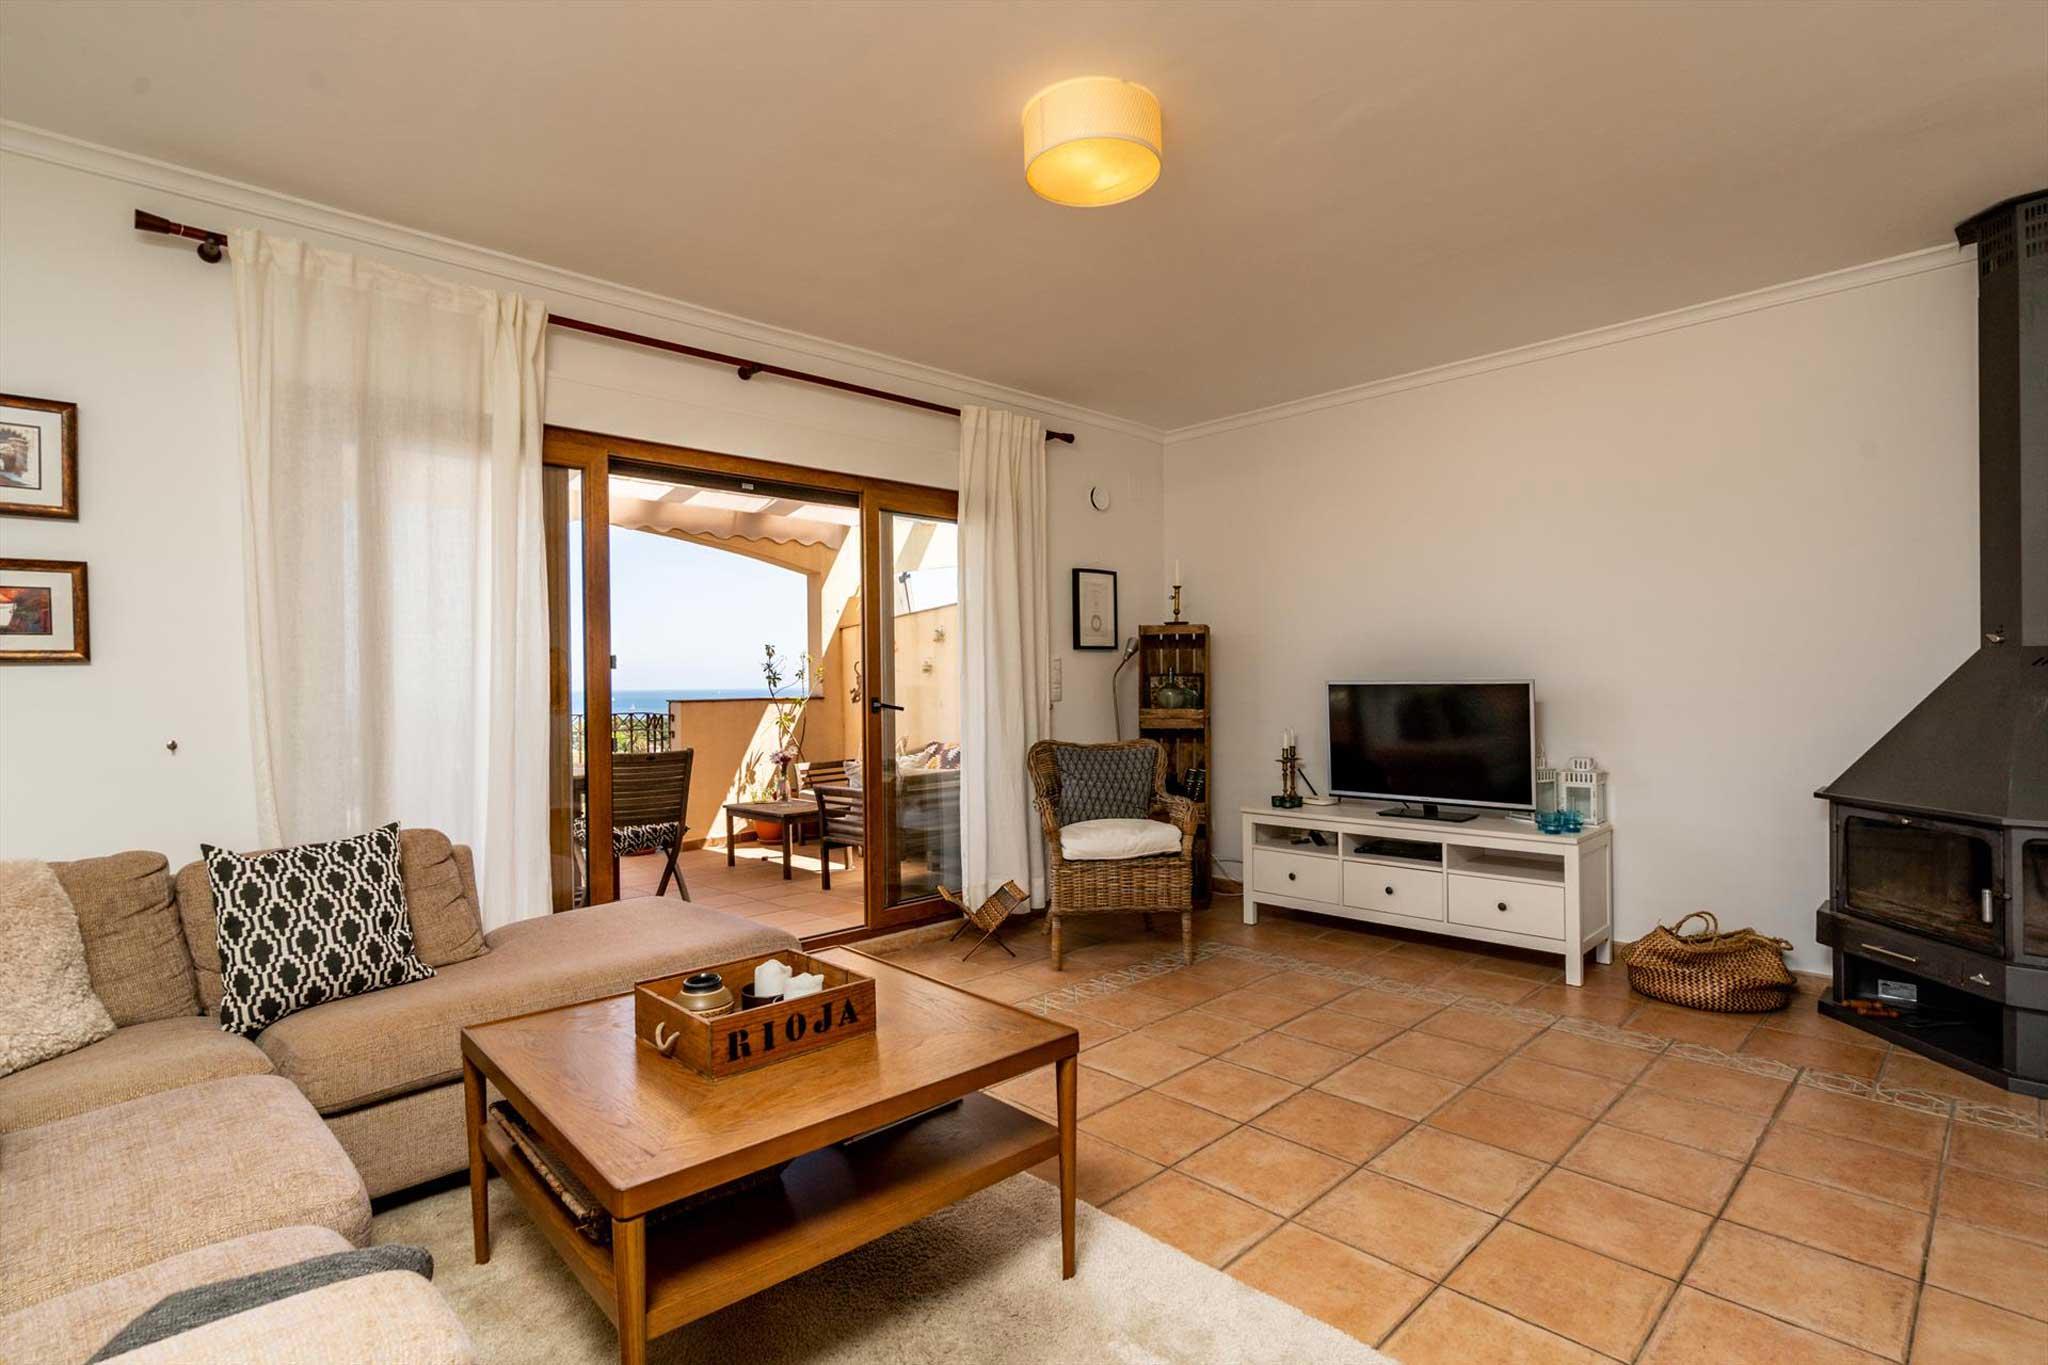 Casa con piscina Denia – Quality Rent a Villa